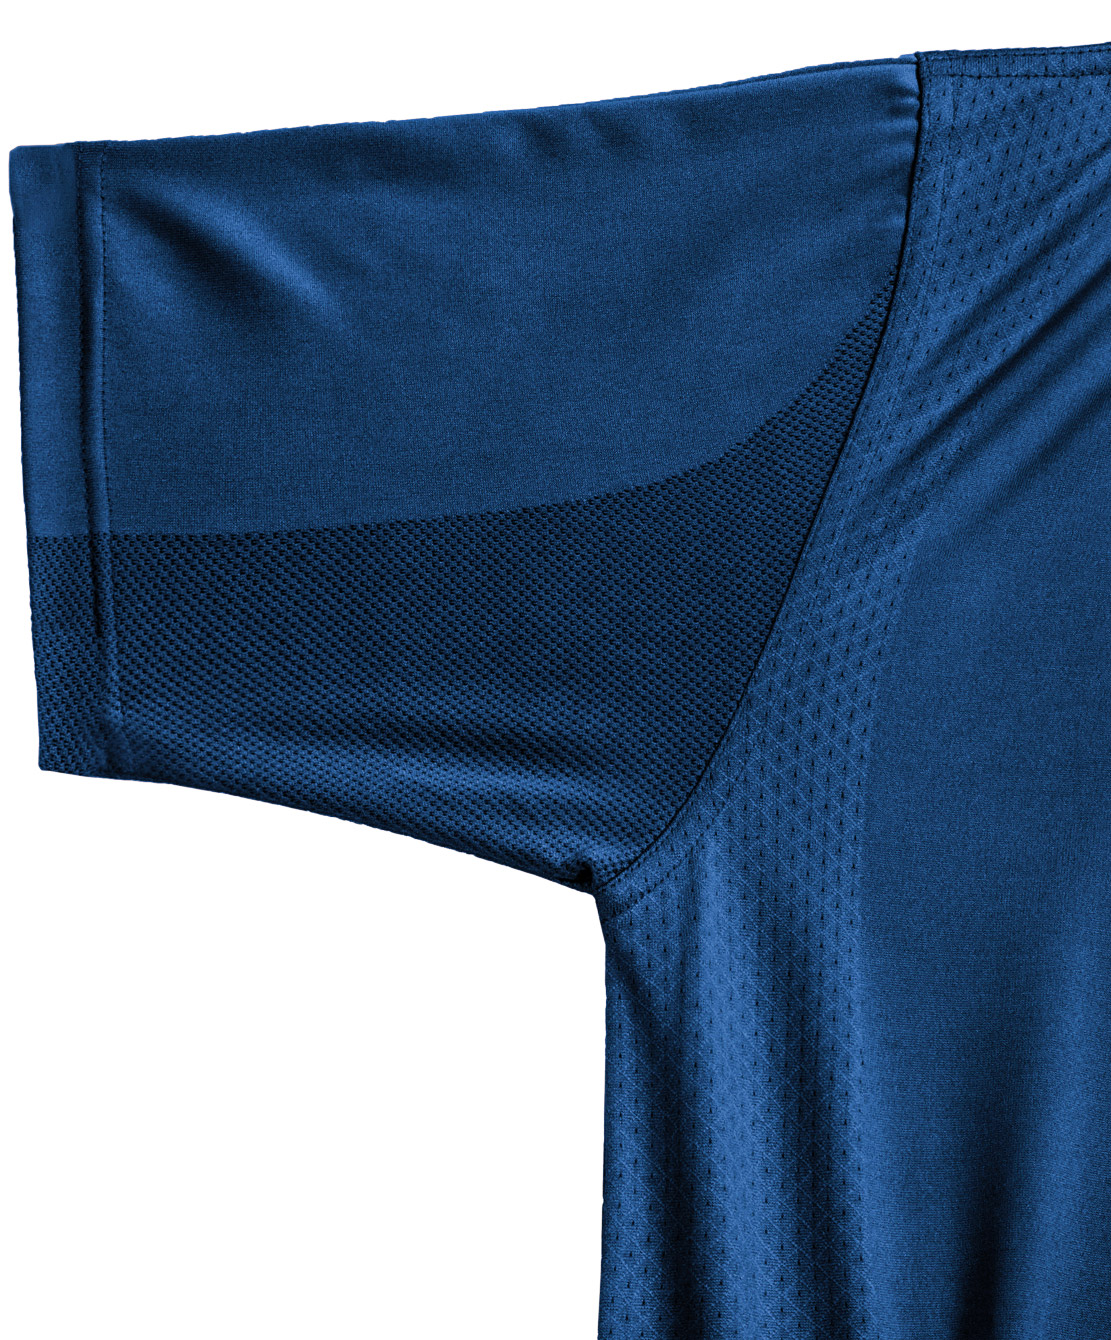 body mapping polo shirt closeup navy